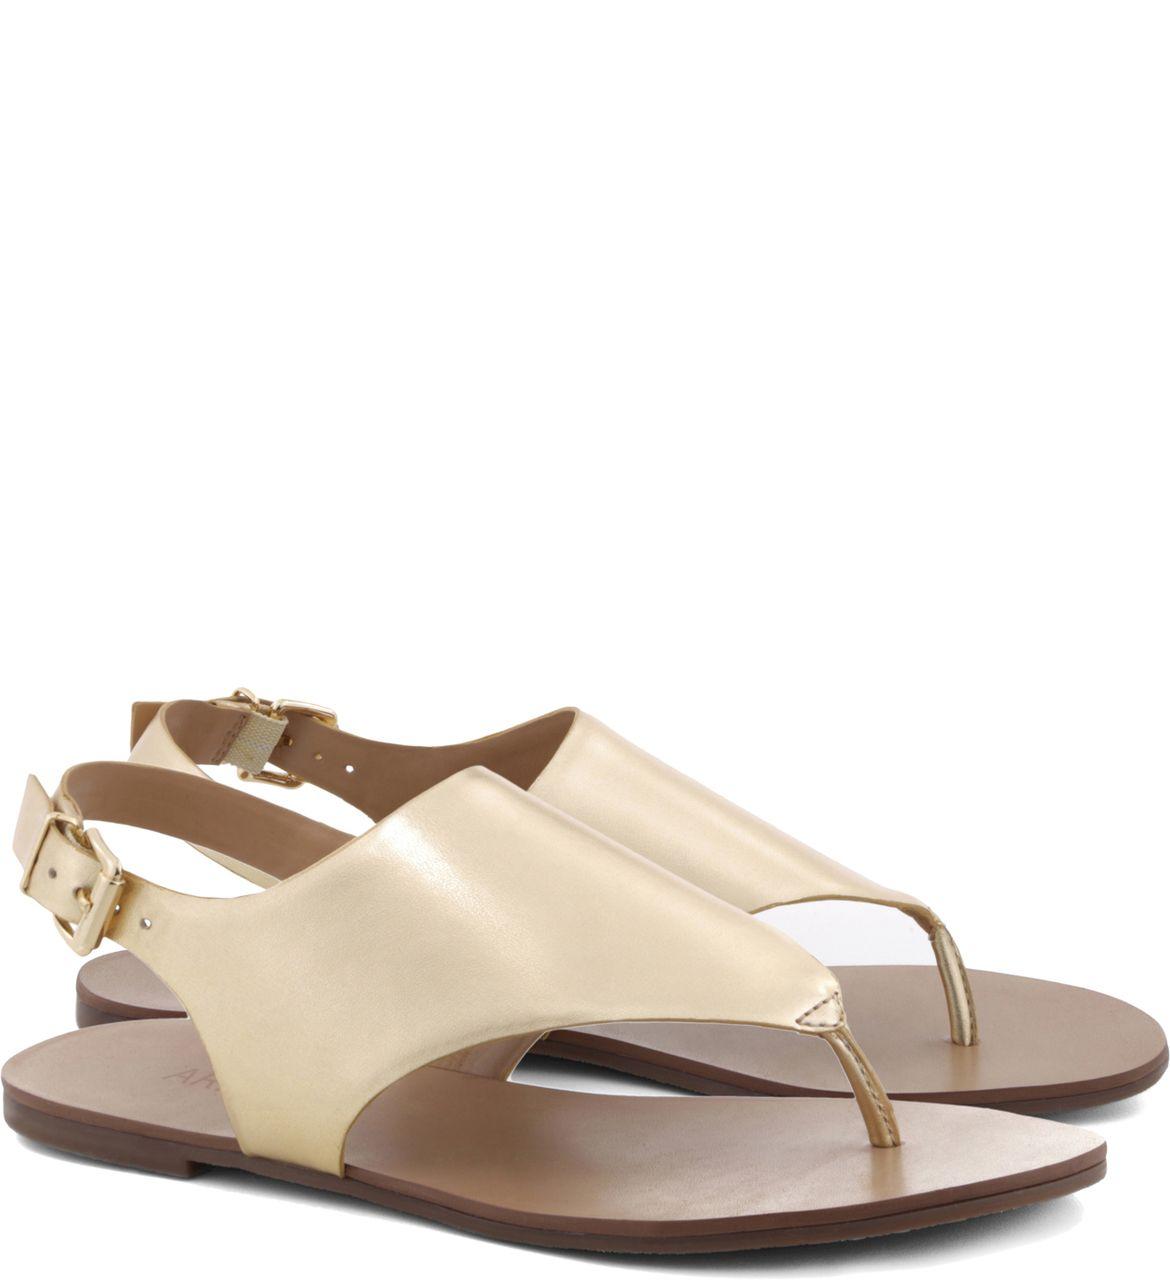 27c130955 Rasteira Gift Ouro   Arezzo   SHOE HO   Shoes, Shoes sandals e Fashion